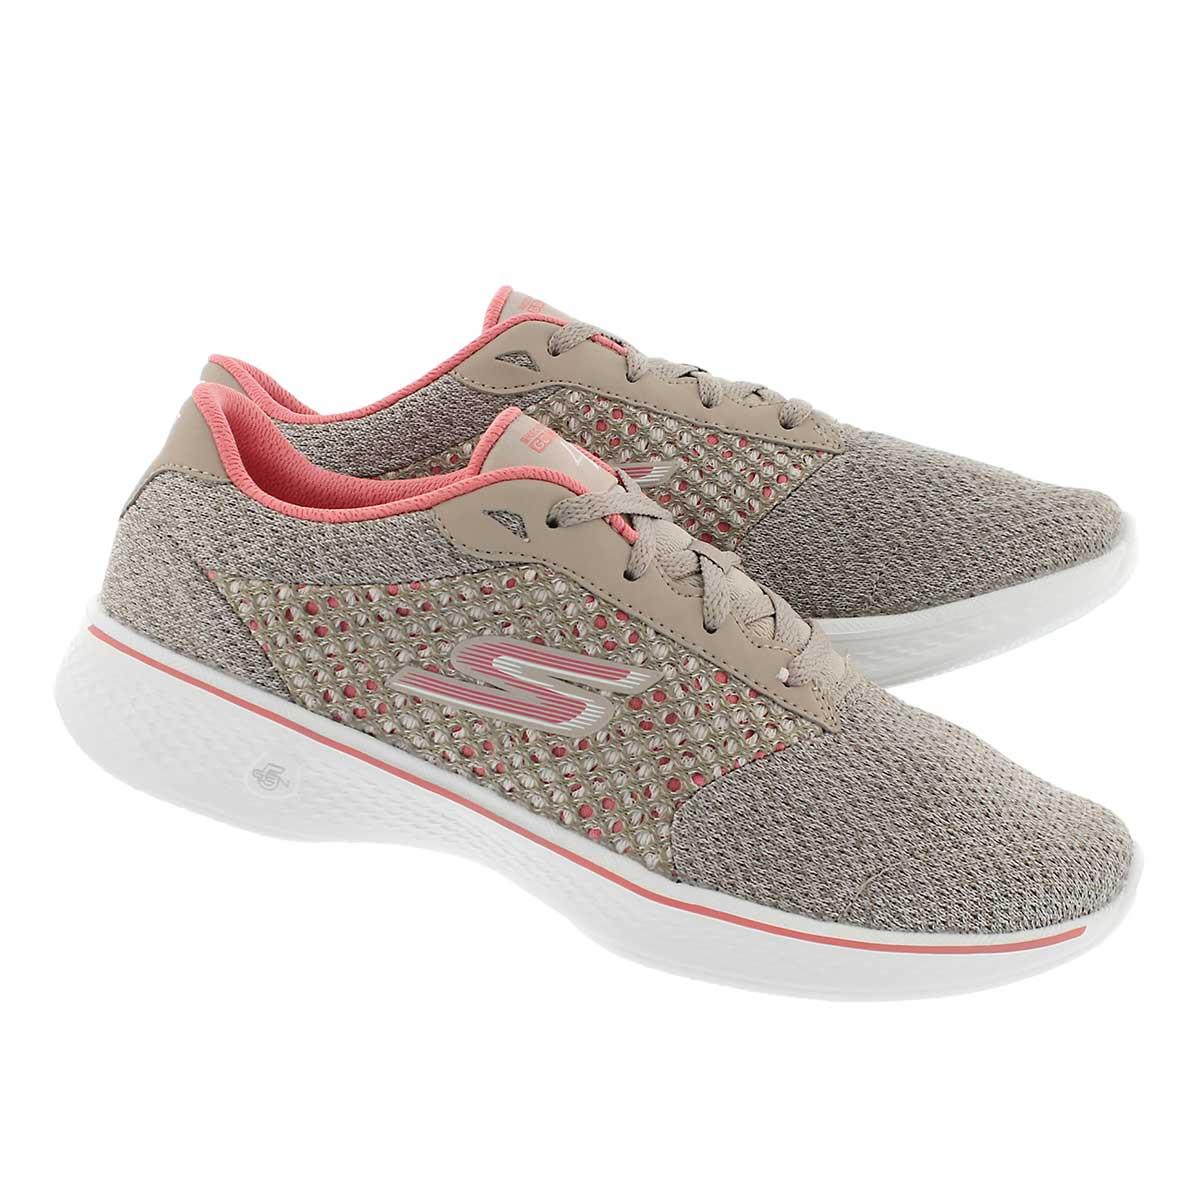 Lds GO Walk 4 Exceed tpe/pk lace up shoe